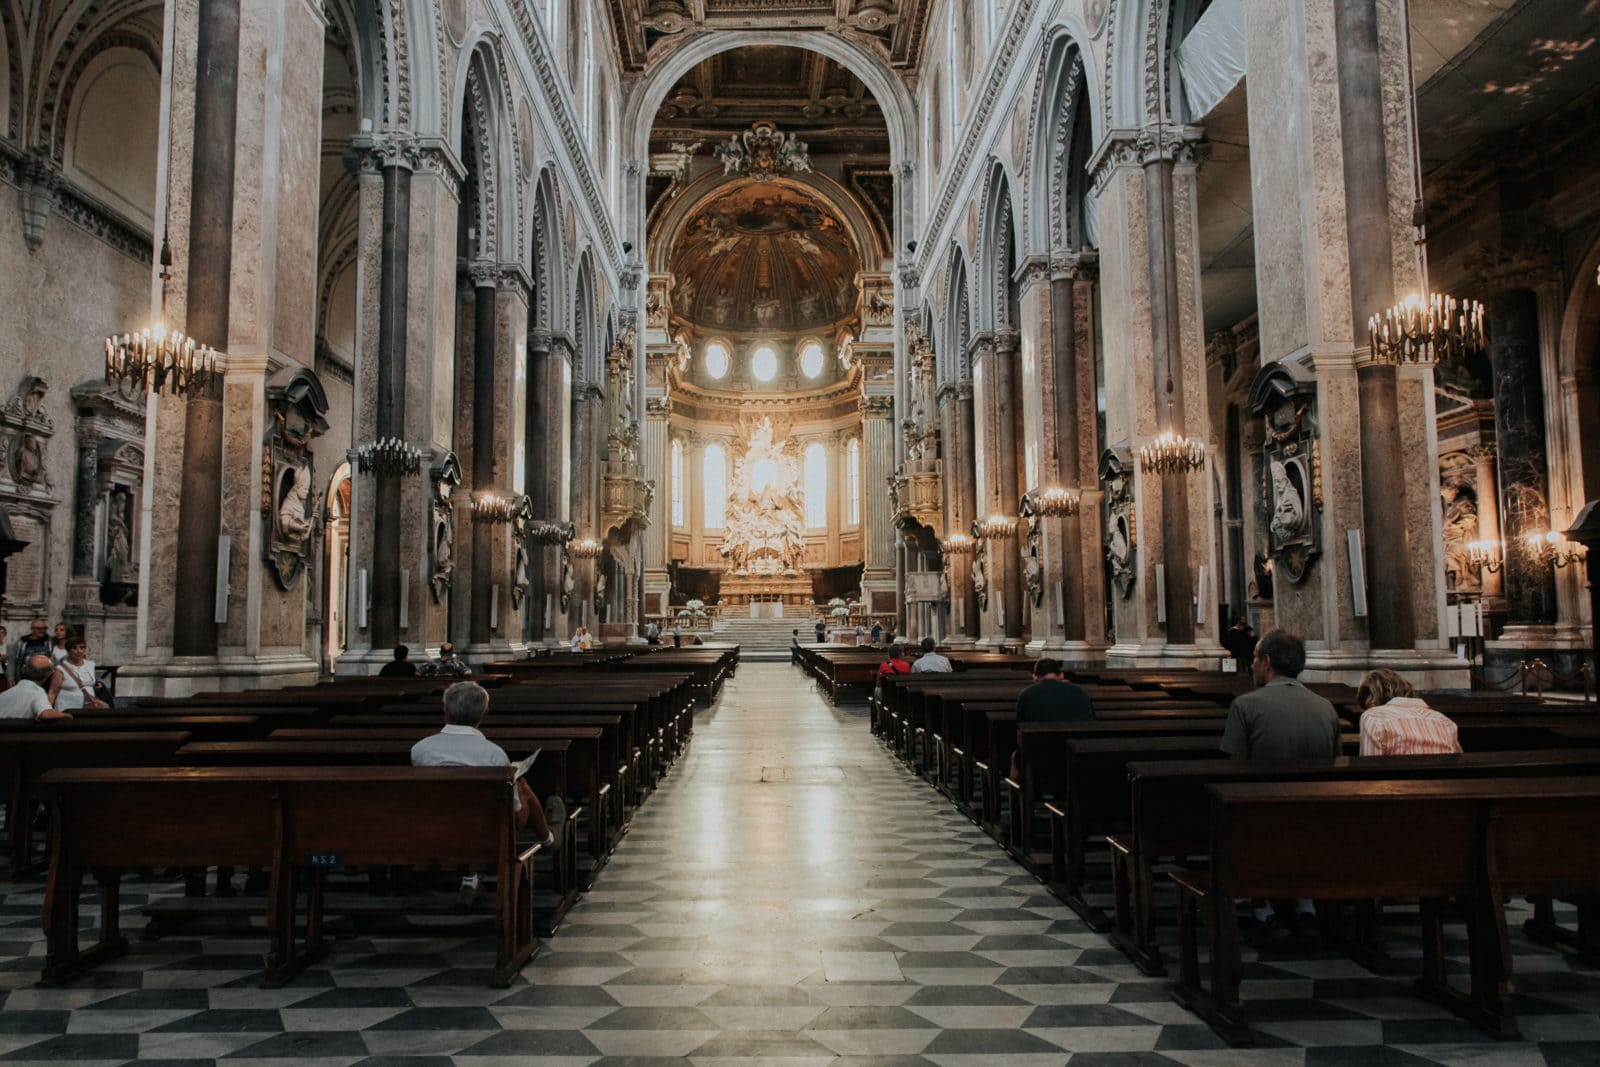 Neapel Sehenswürdigkeiten Duomo innen